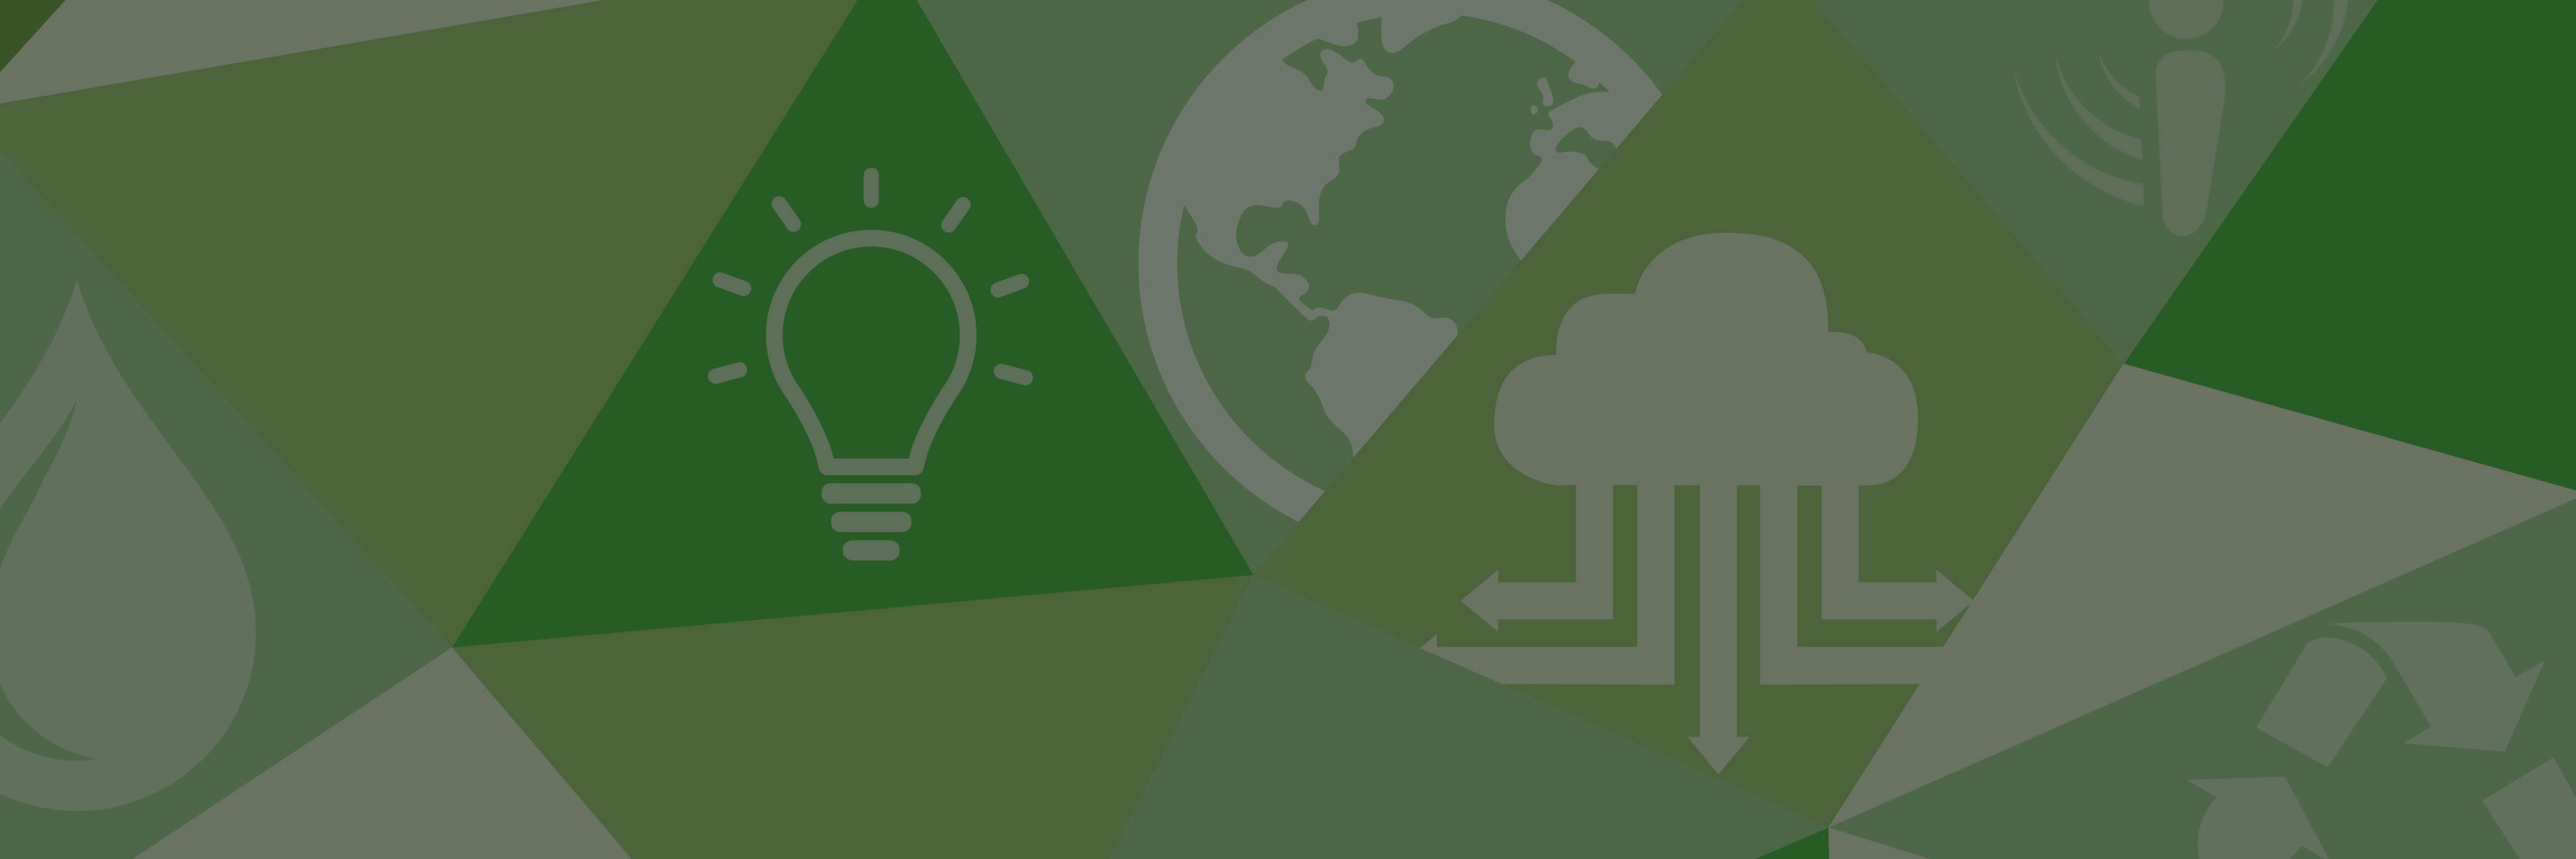 naem-webinar-2017-sustainability-management-conference-livestream-1800x600